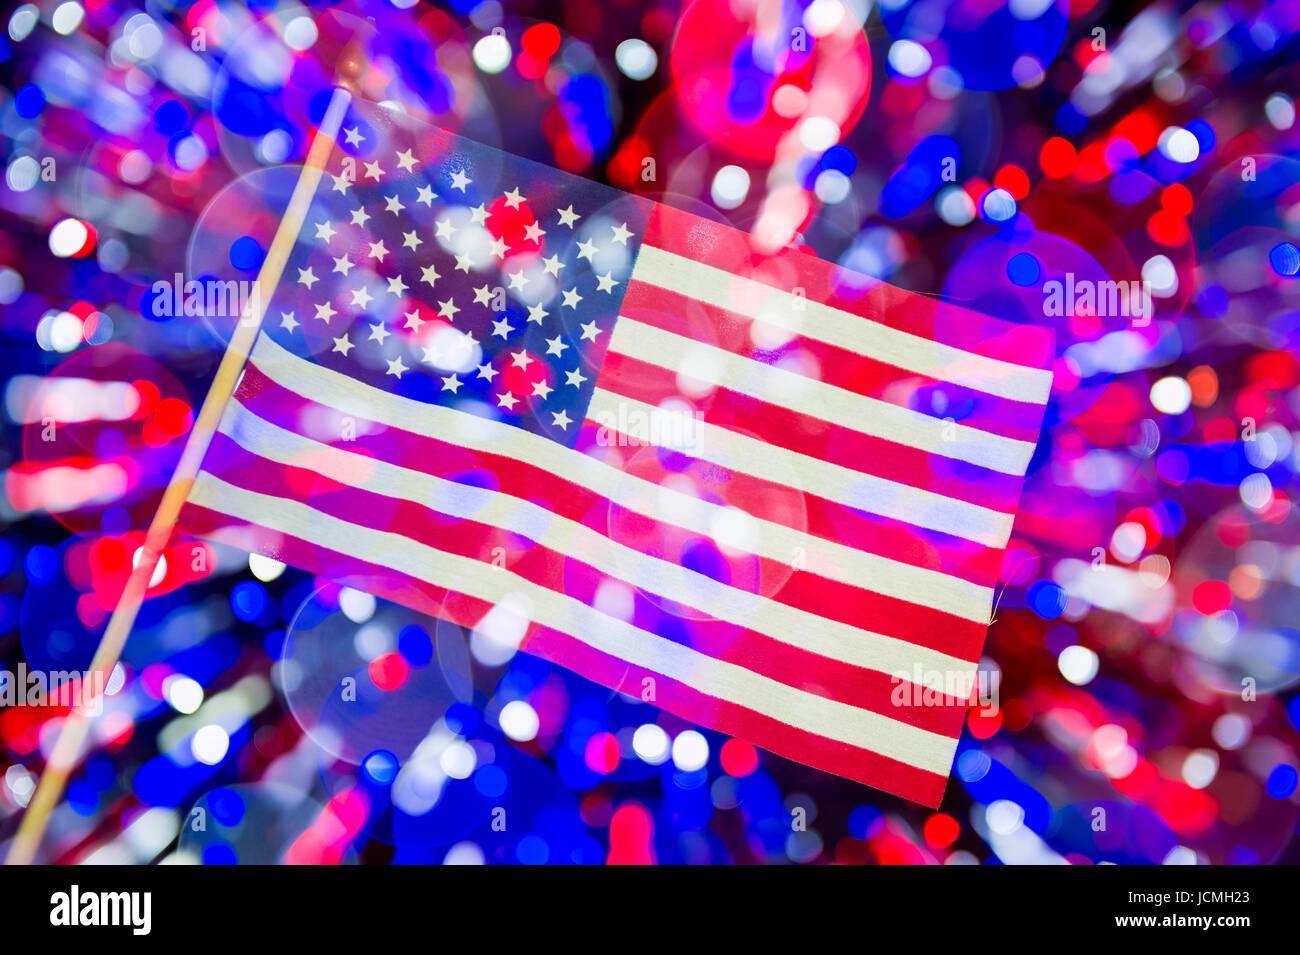 American Flag Fireworks Stock Photos & American Flag